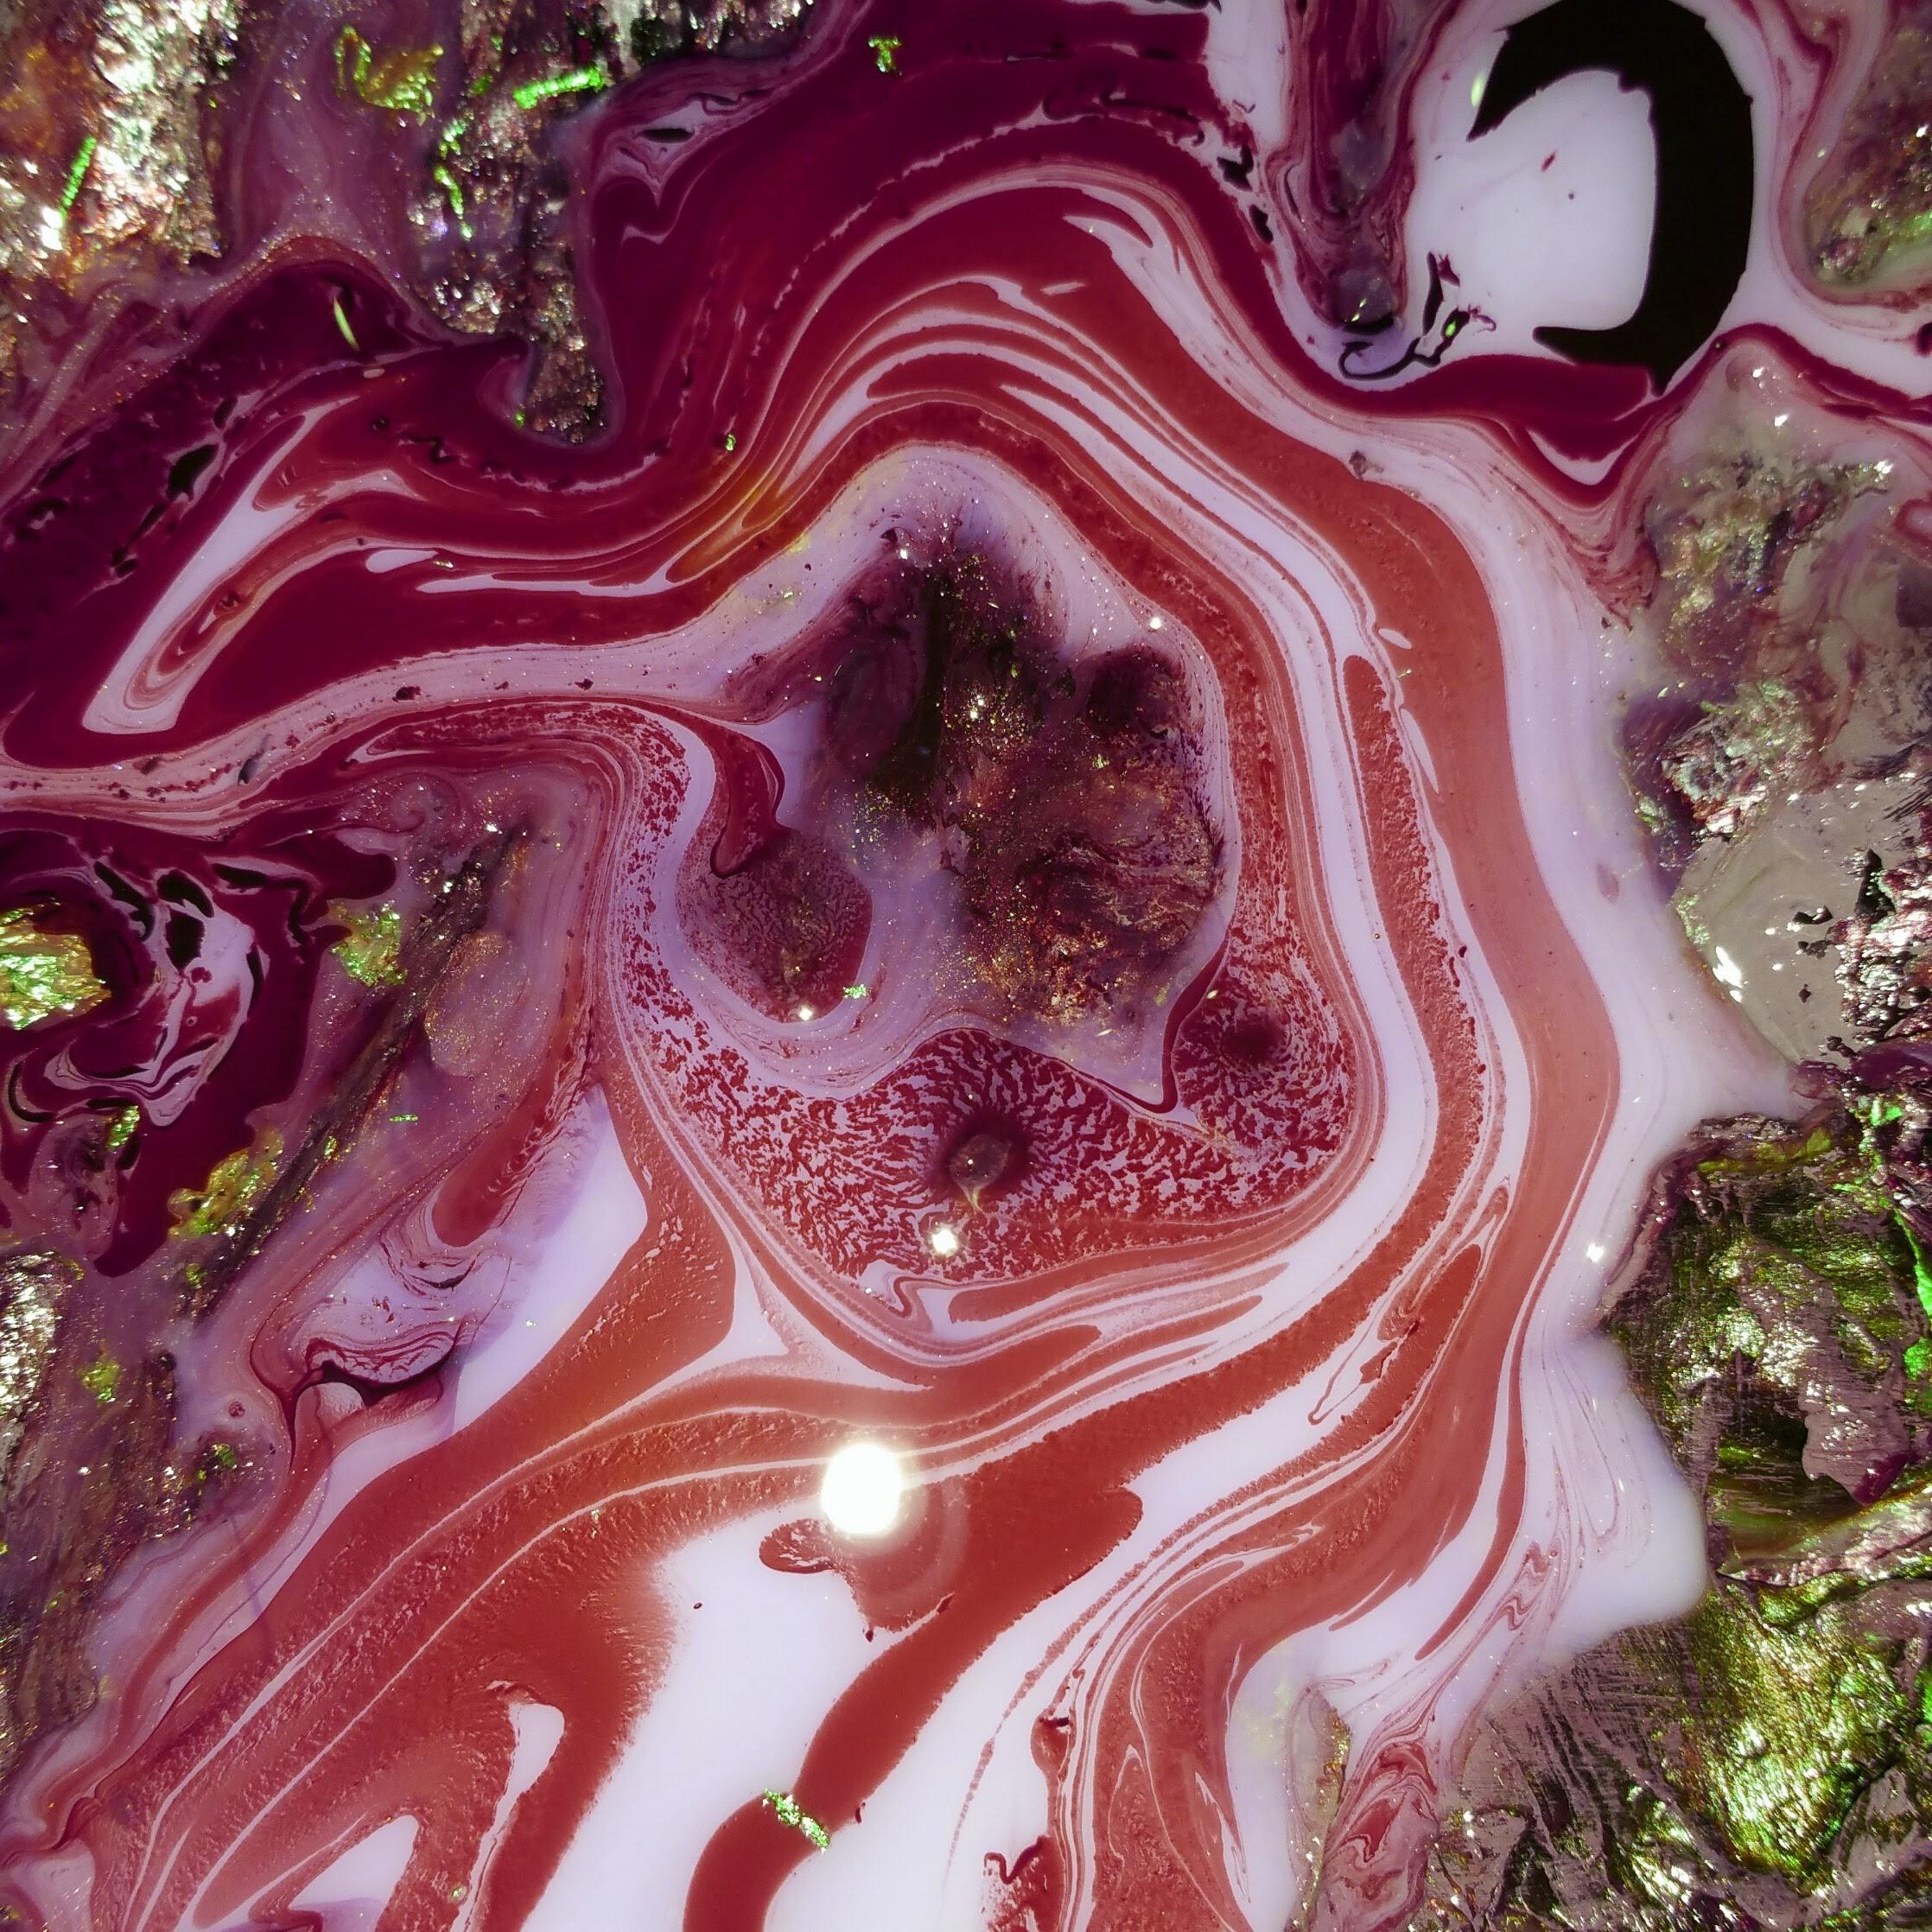 Contact - Ruby Runs Deep acyrlic art